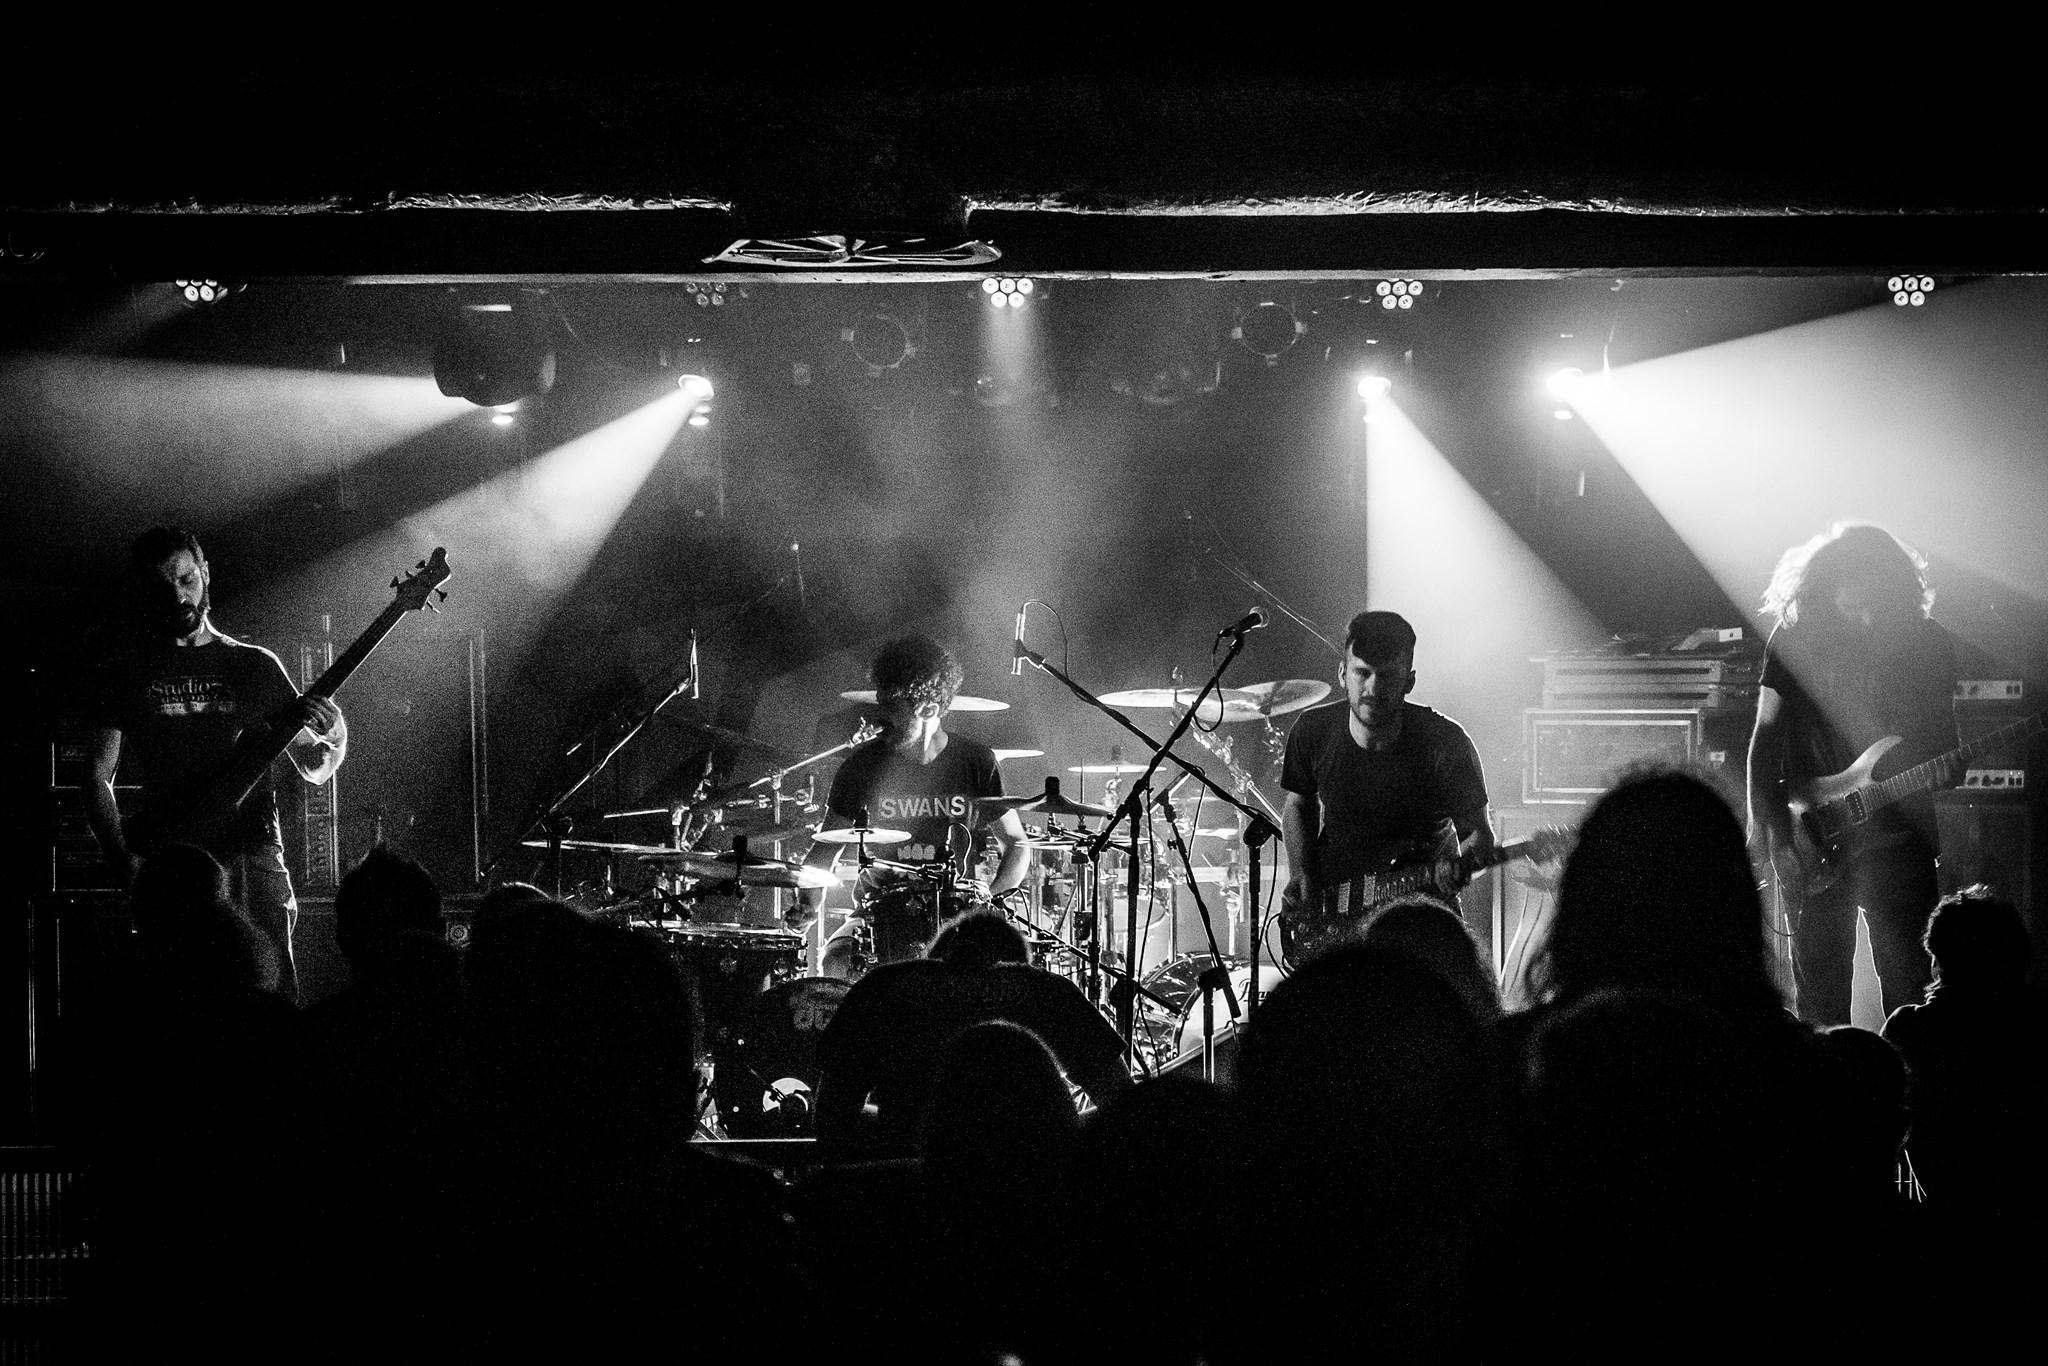 Nero di Marte Announces New Album and Shares First Single